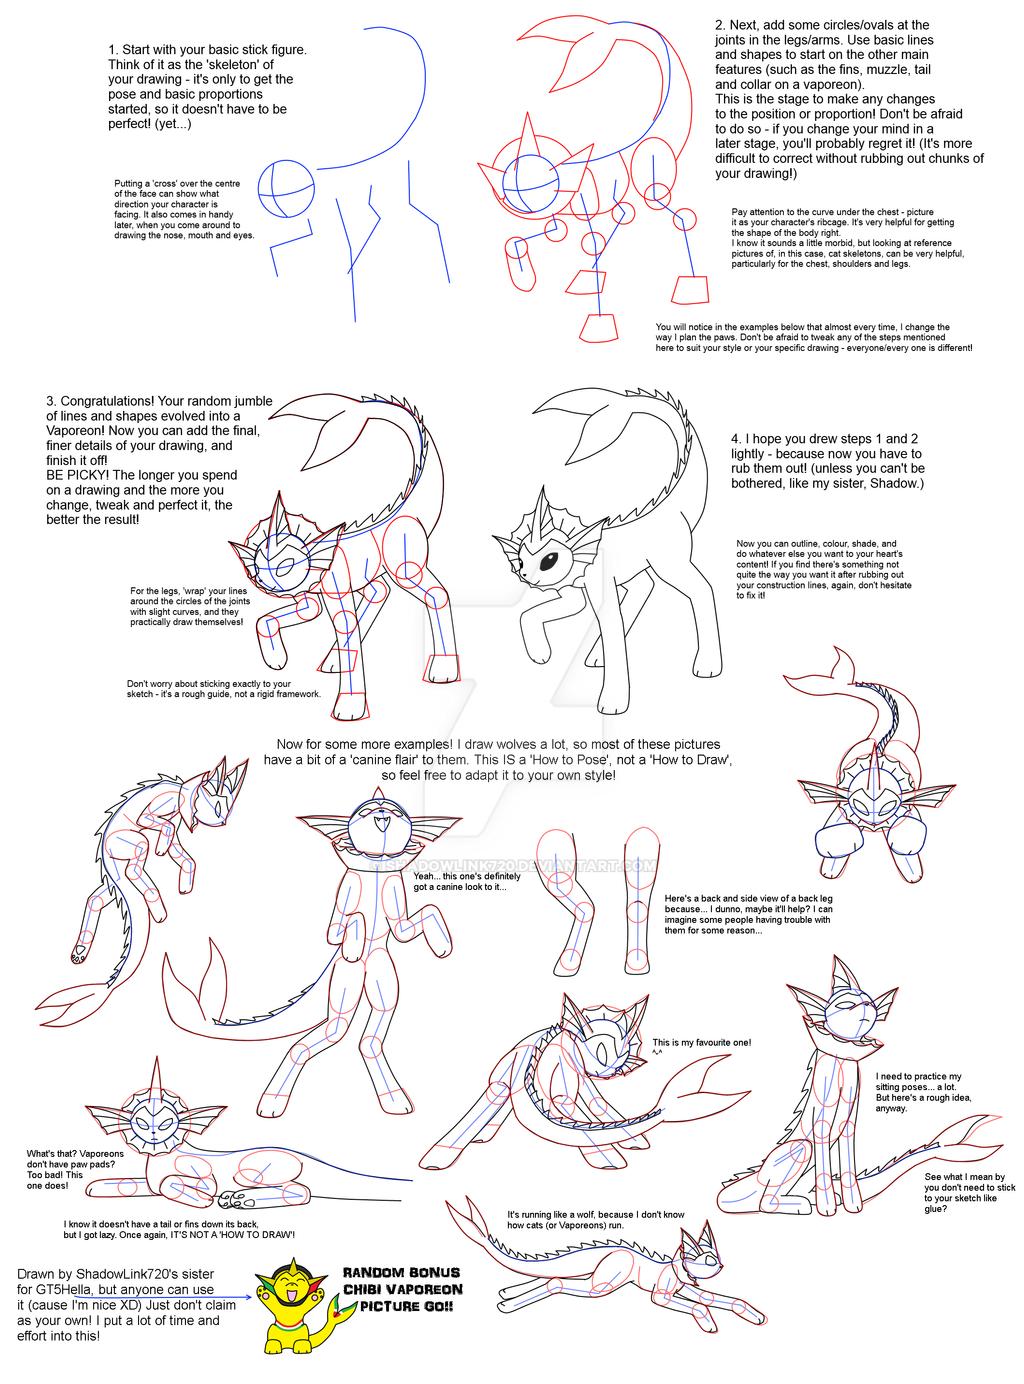 Random 'how To Pose' Tutorial! By Shadowlink720